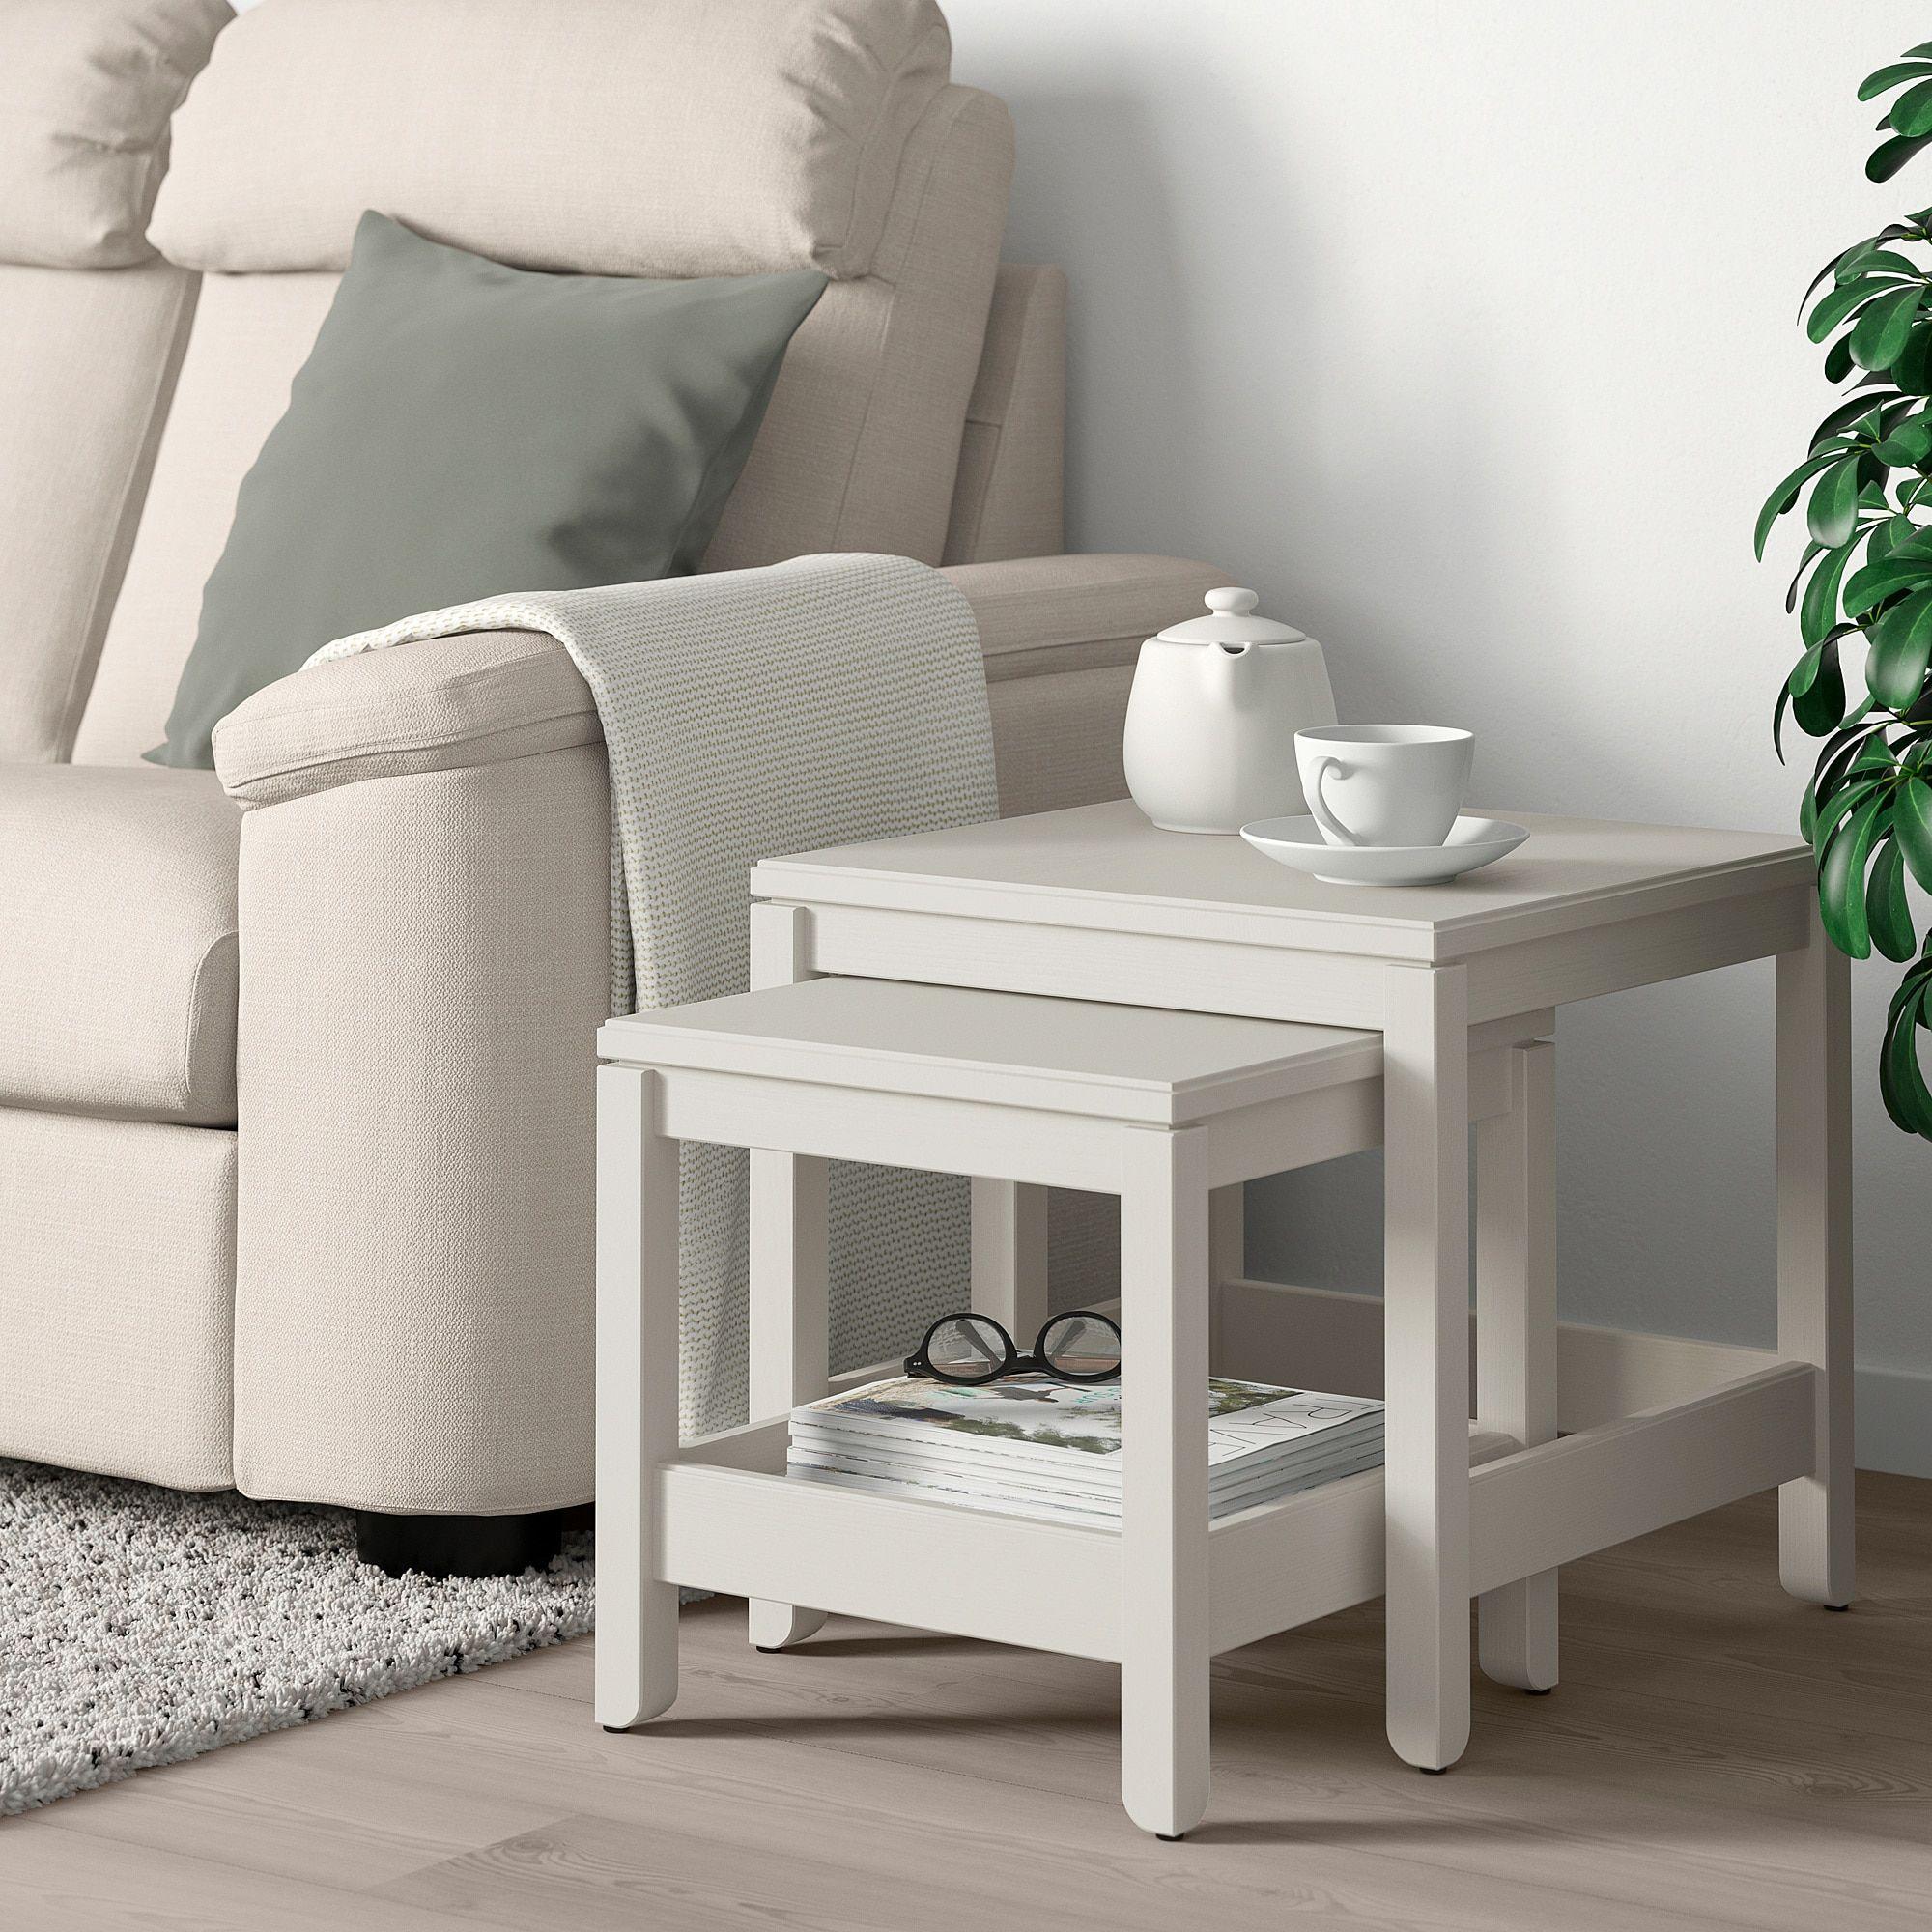 Ikea Havsta Nesting Tables Set Of 2 White In 2019